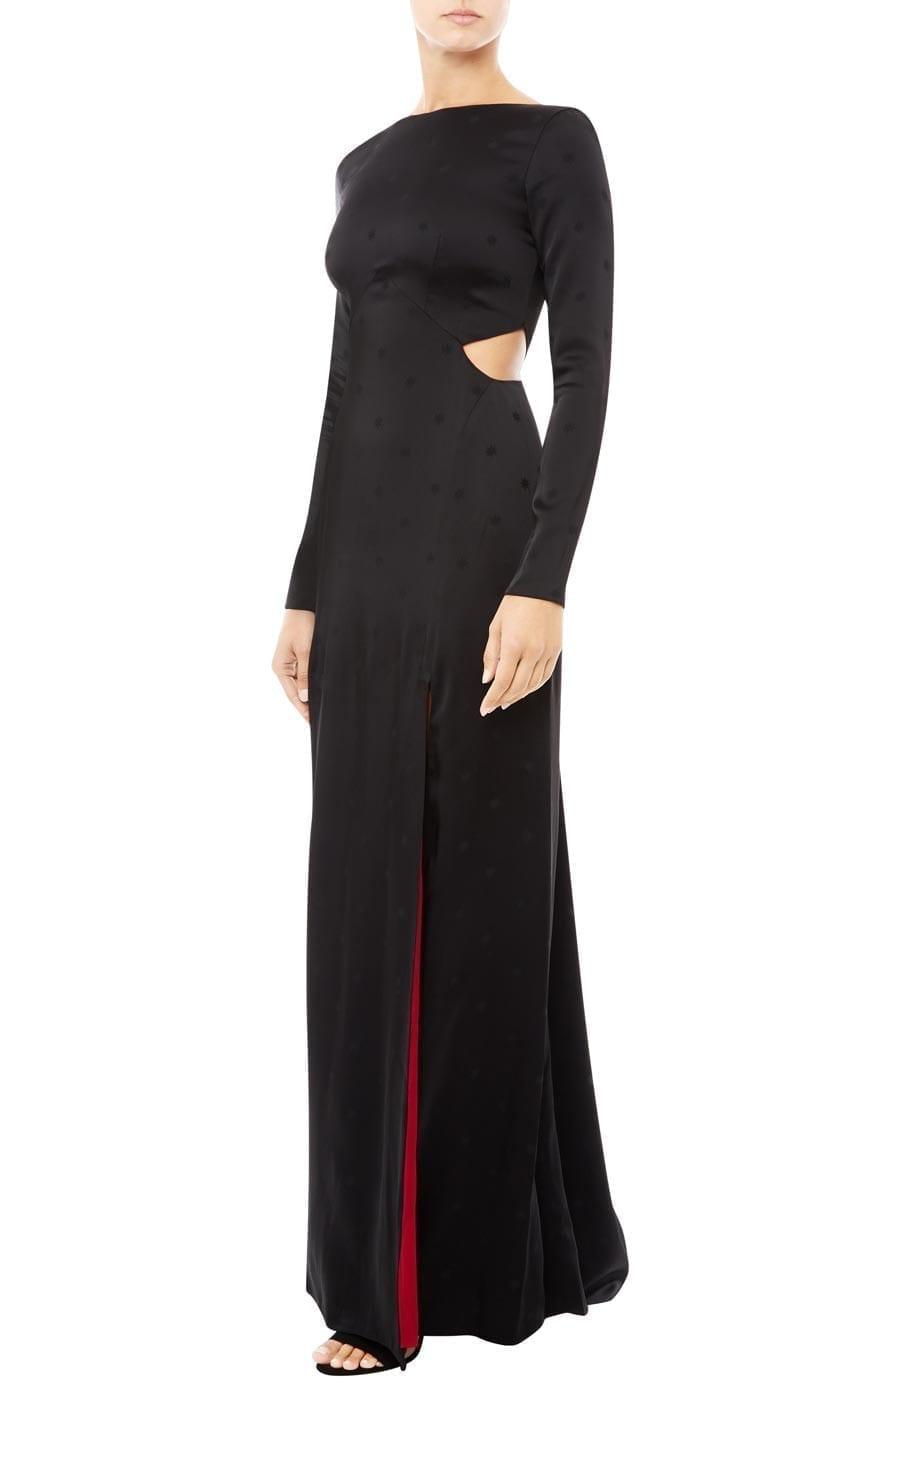 BETTY Split Black Dress